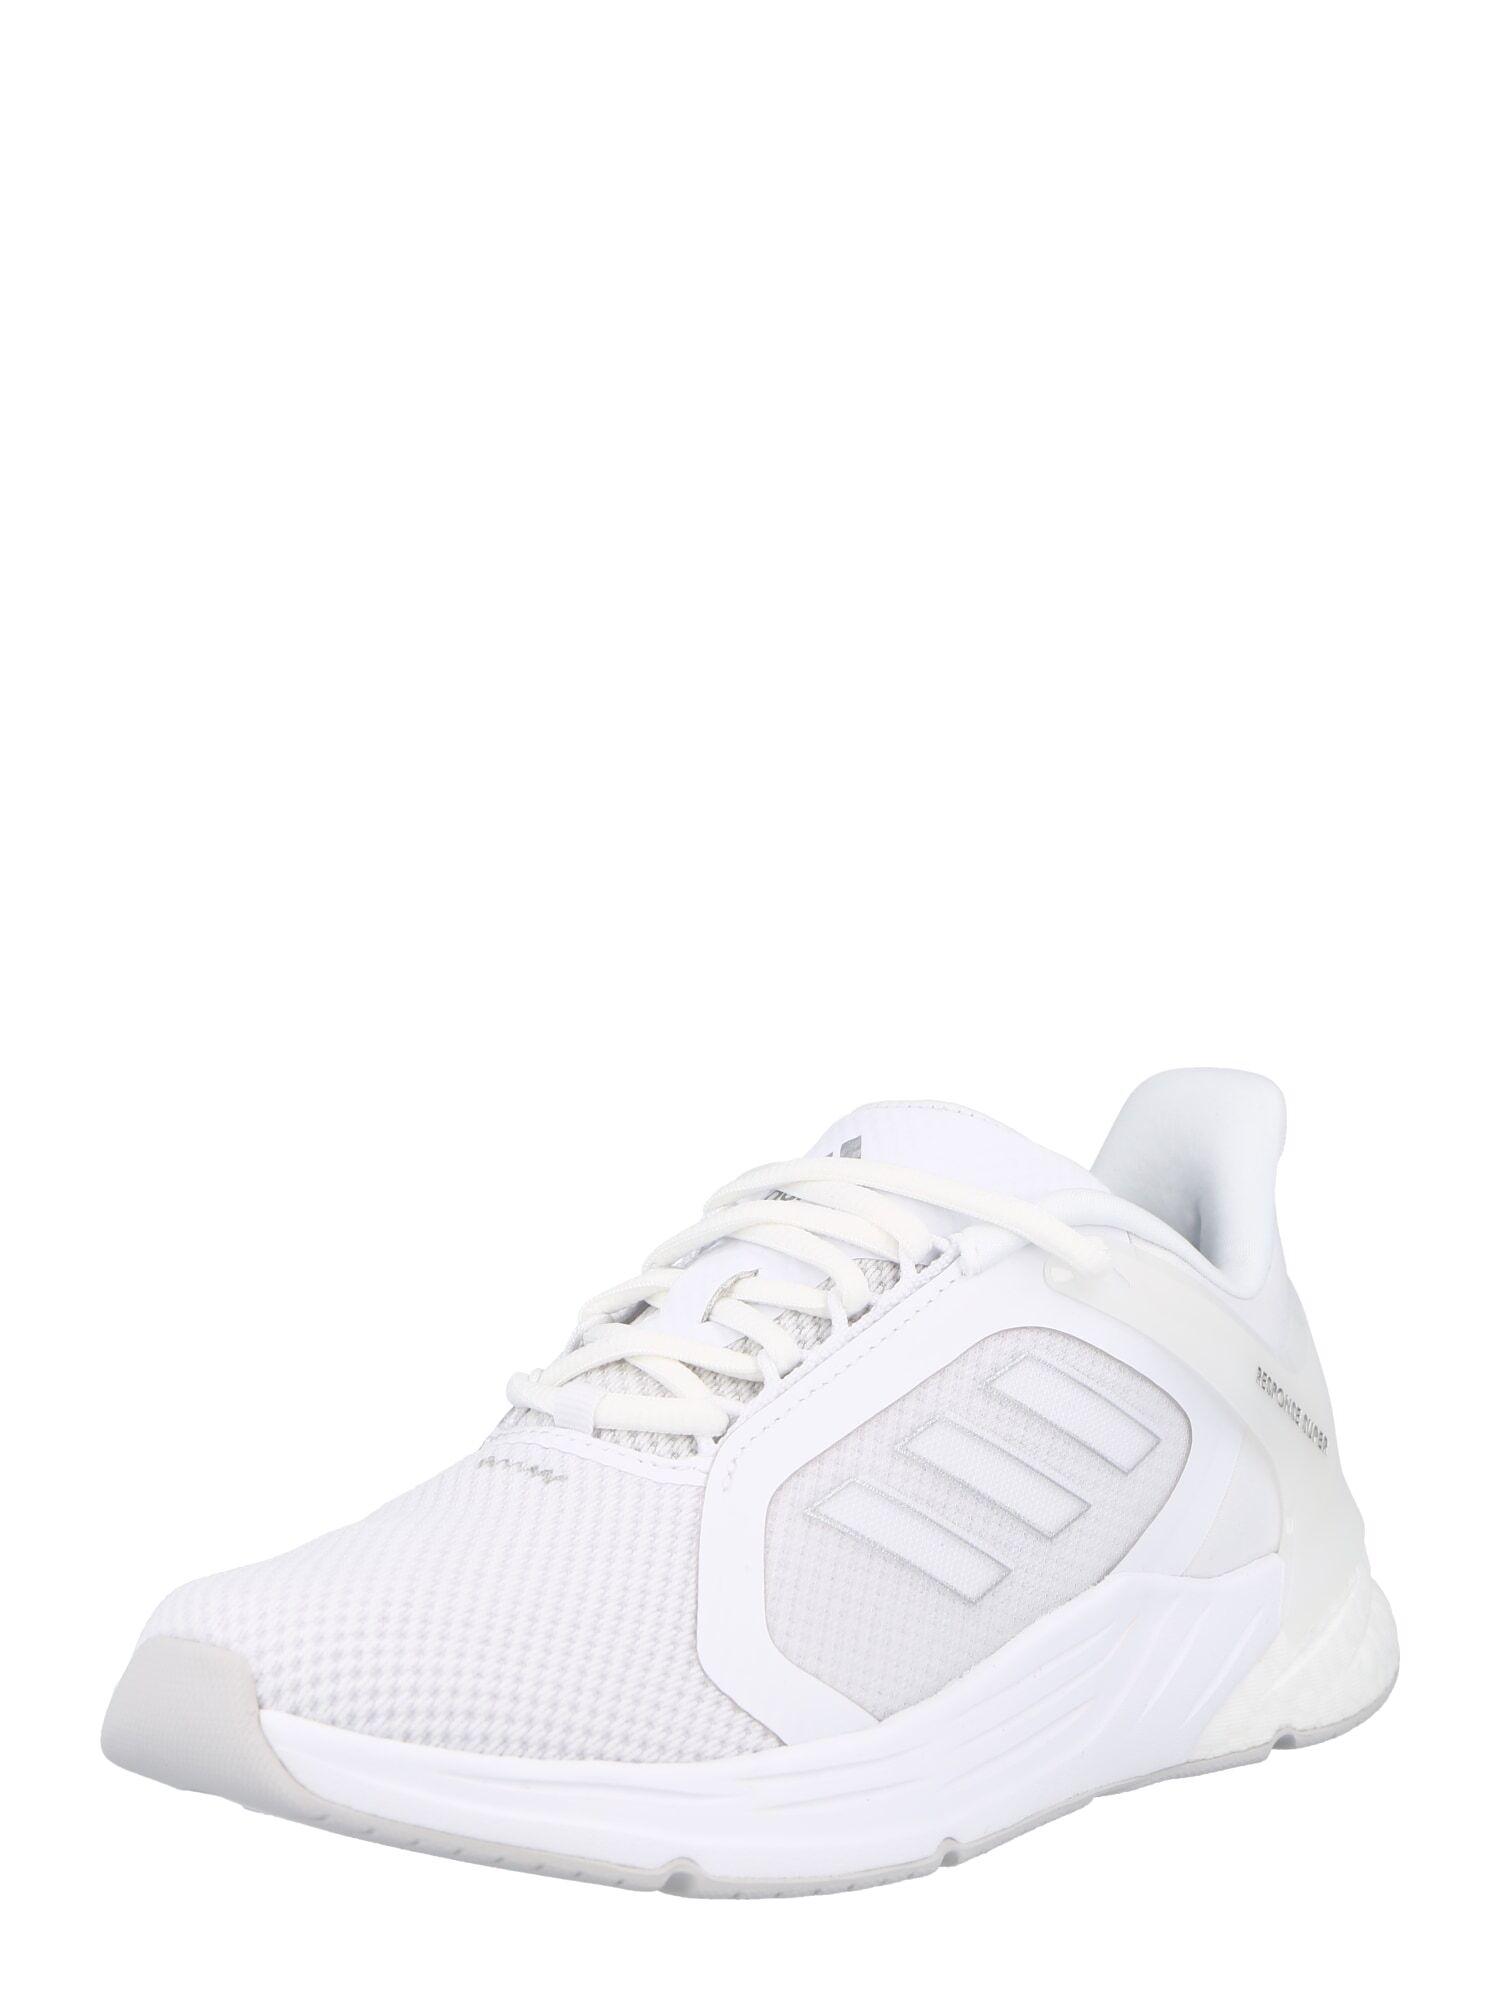 adidas performance scarpa da corsa 'response super 2.0' bianco